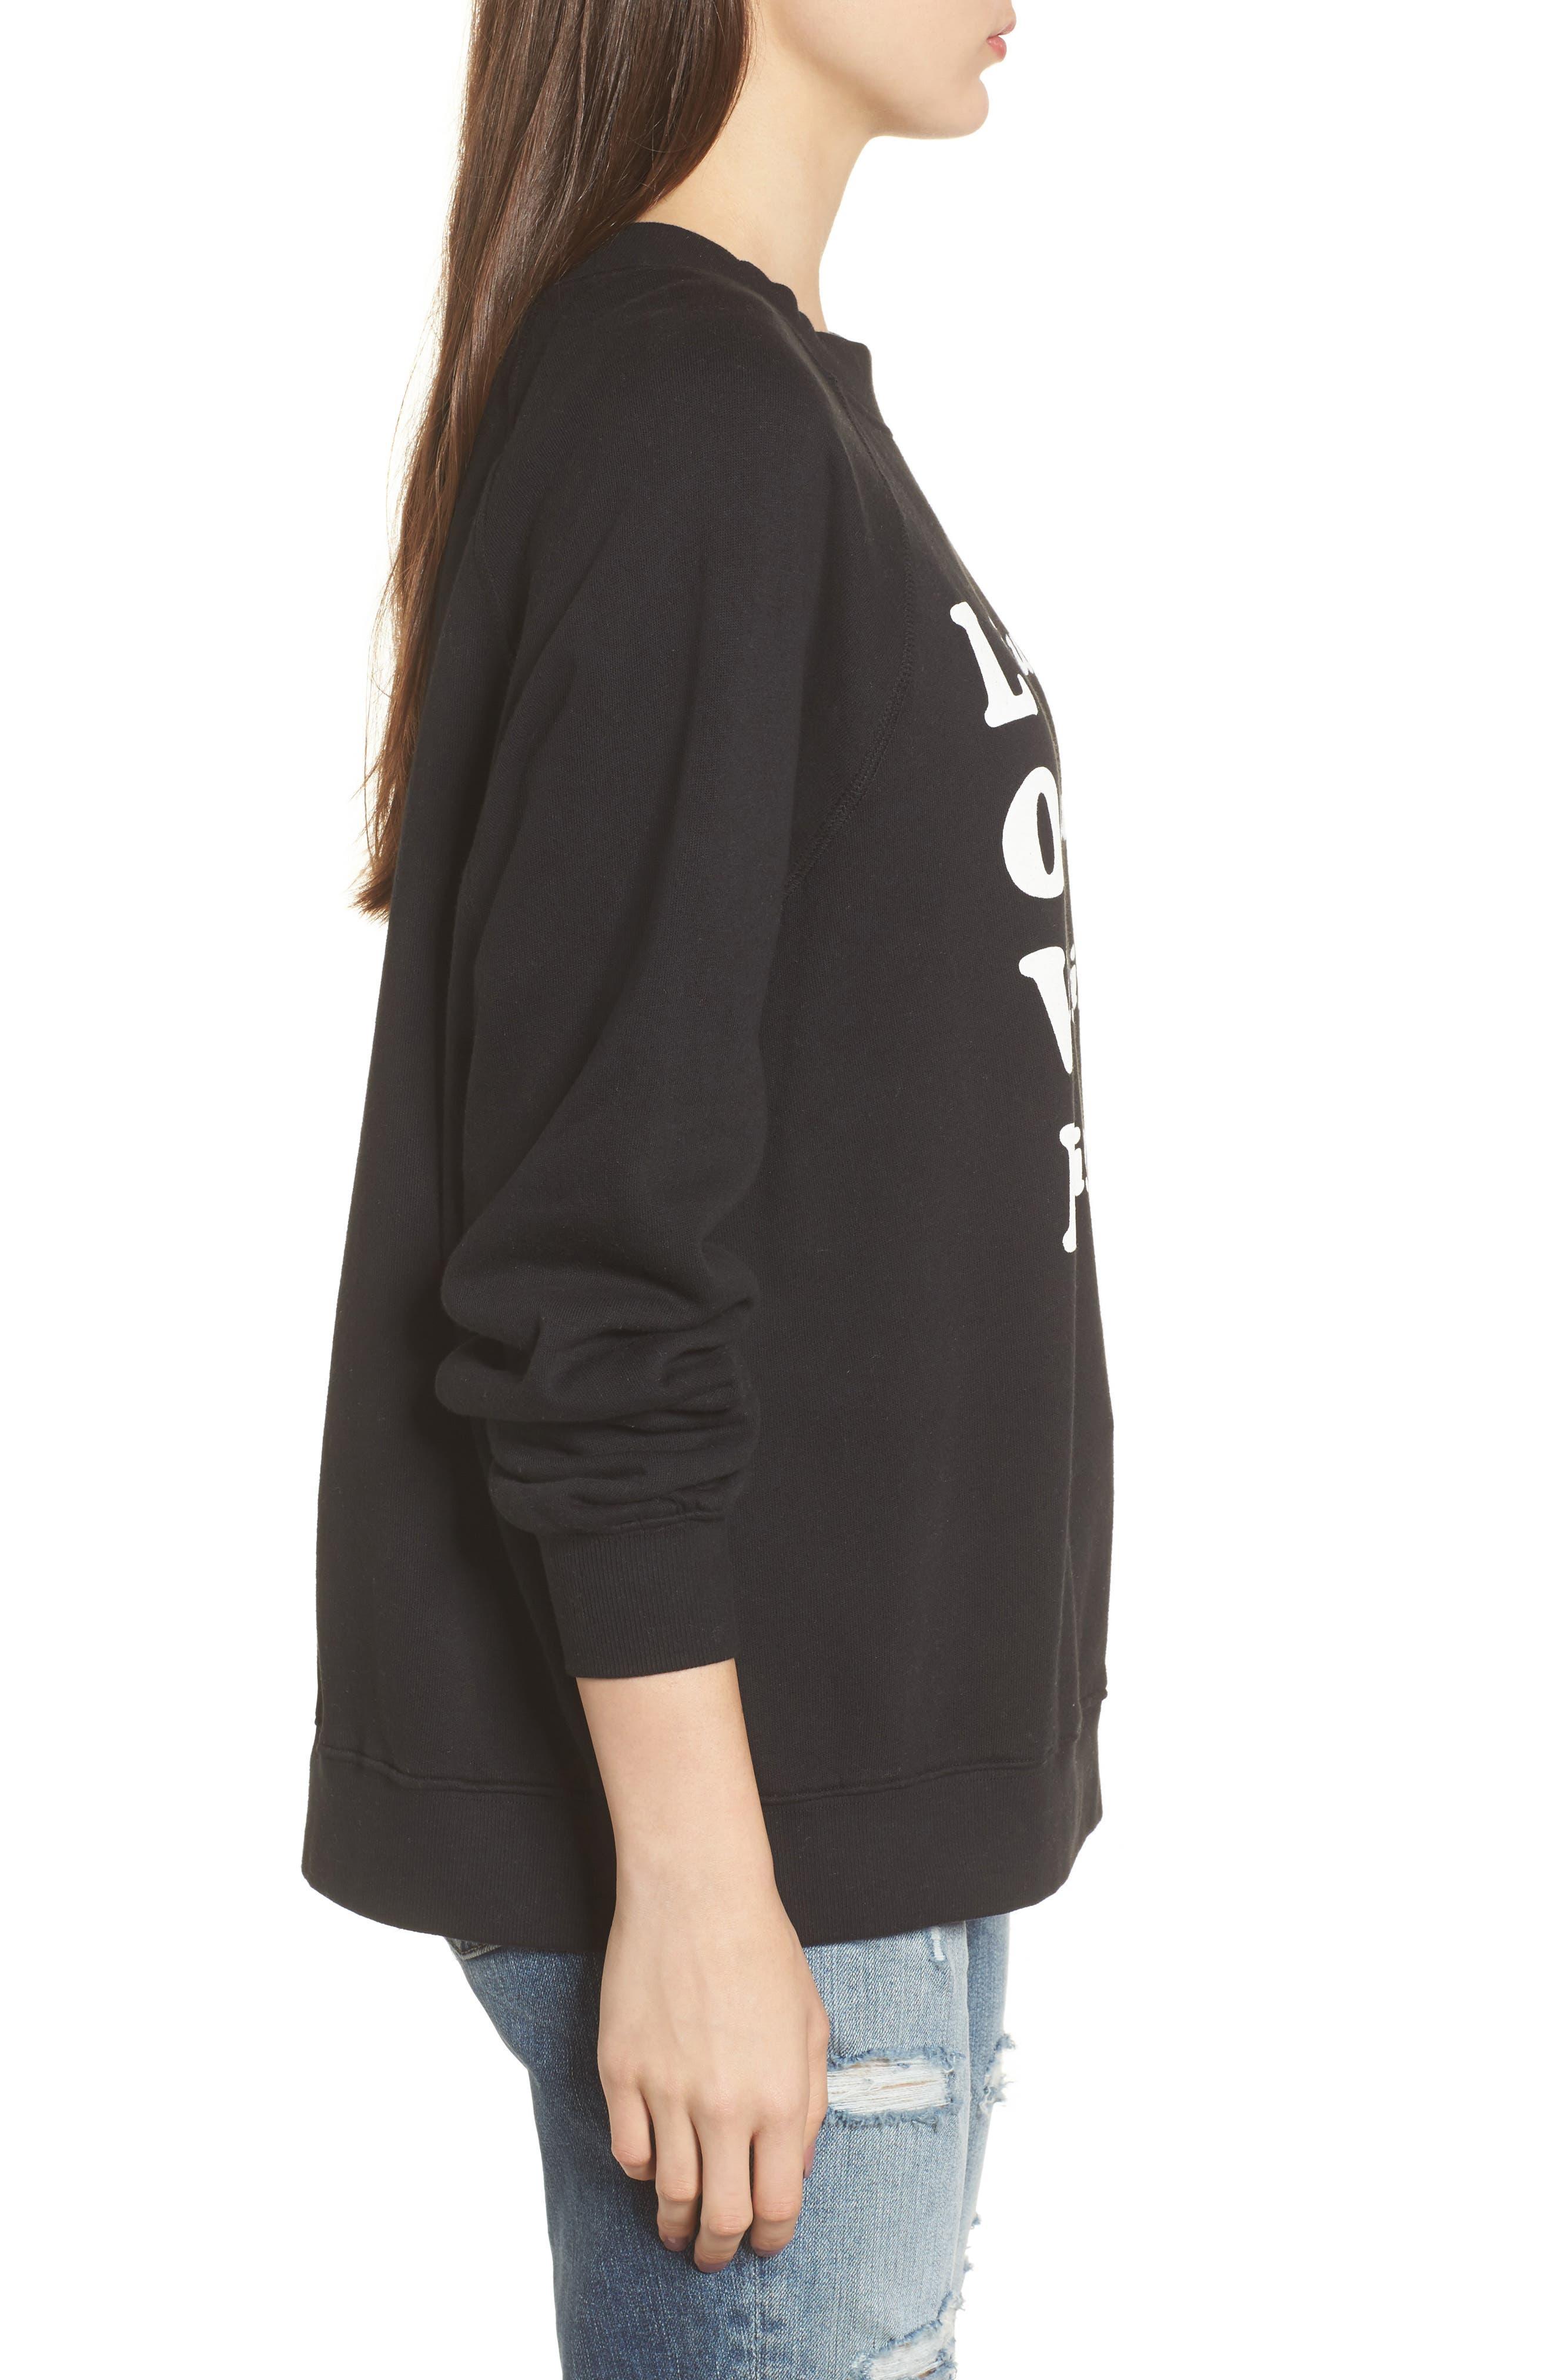 Wino - Sommers Sweatshirt,                             Alternate thumbnail 3, color,                             Black